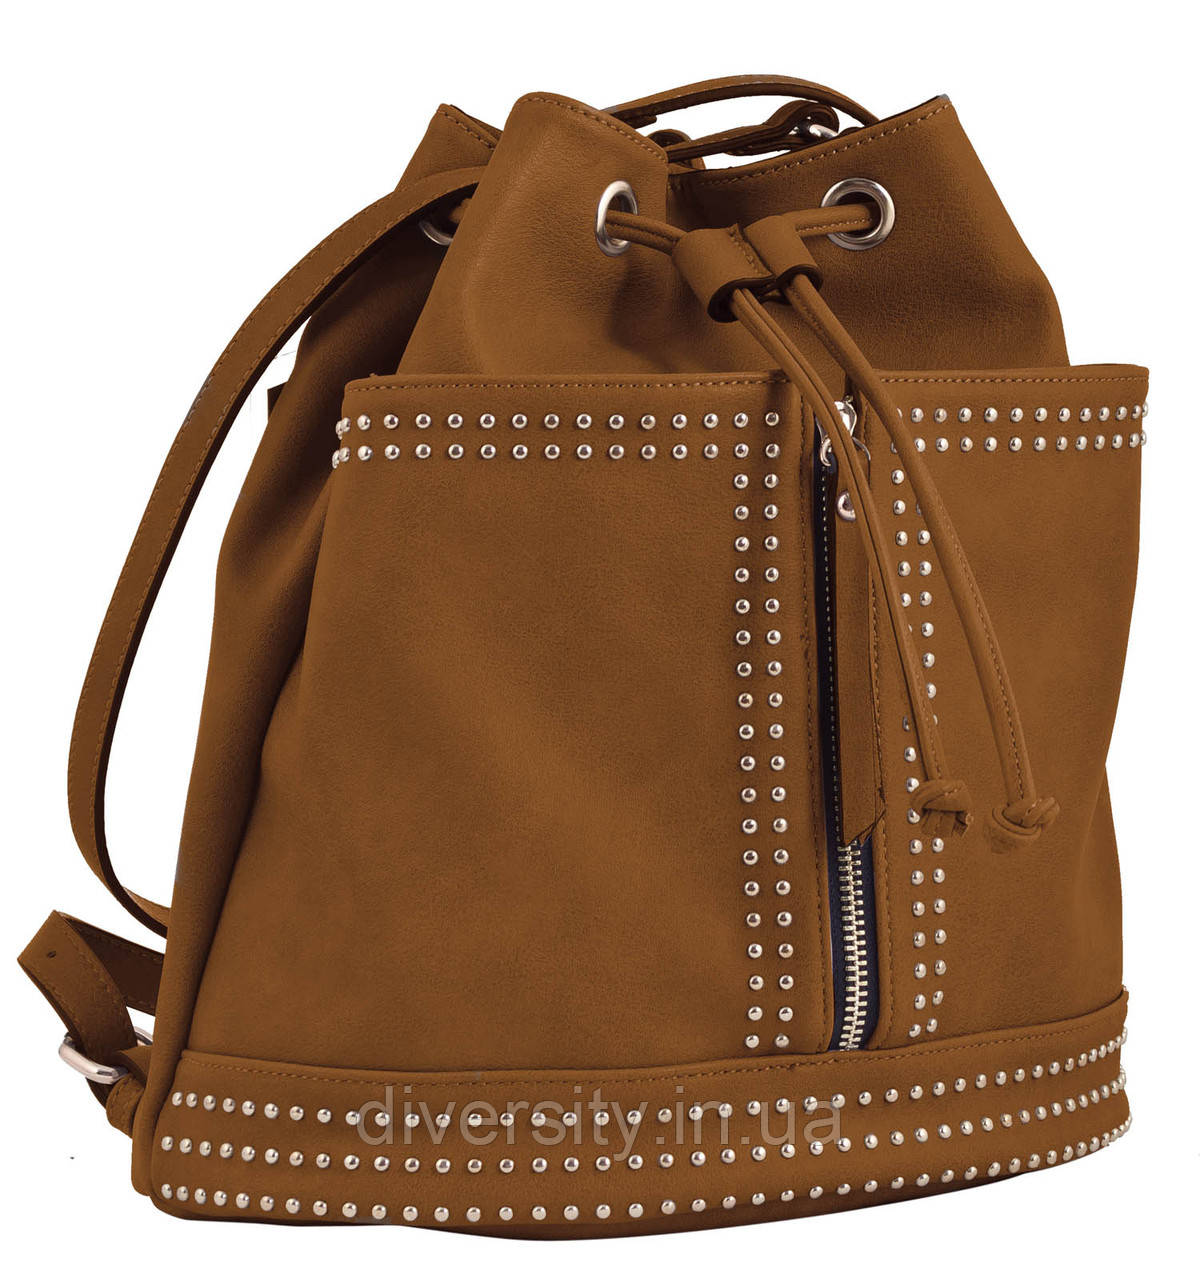 Стильная cумка- рюкзак  Weekend от компании Yes  рыжая, 30*27*15.5